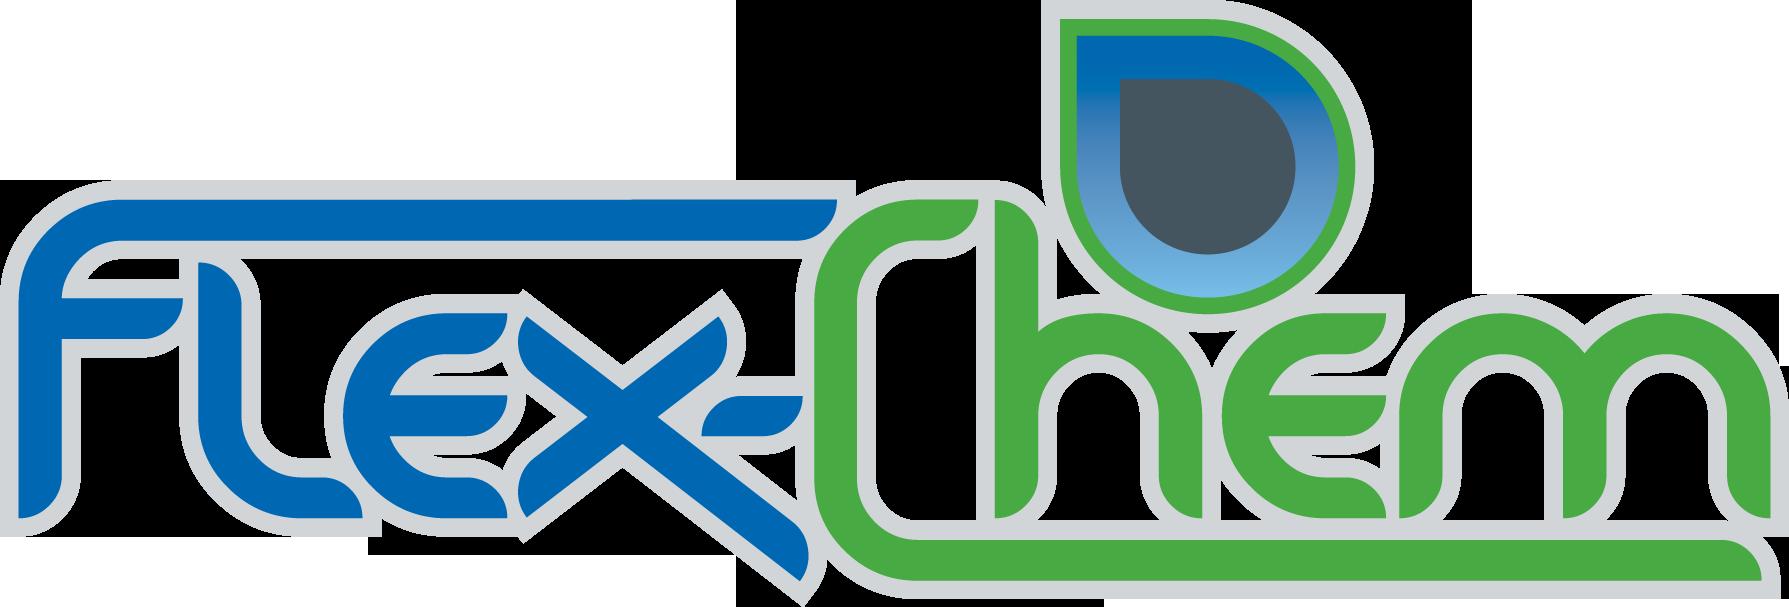 Flex-Chem PNG Logo